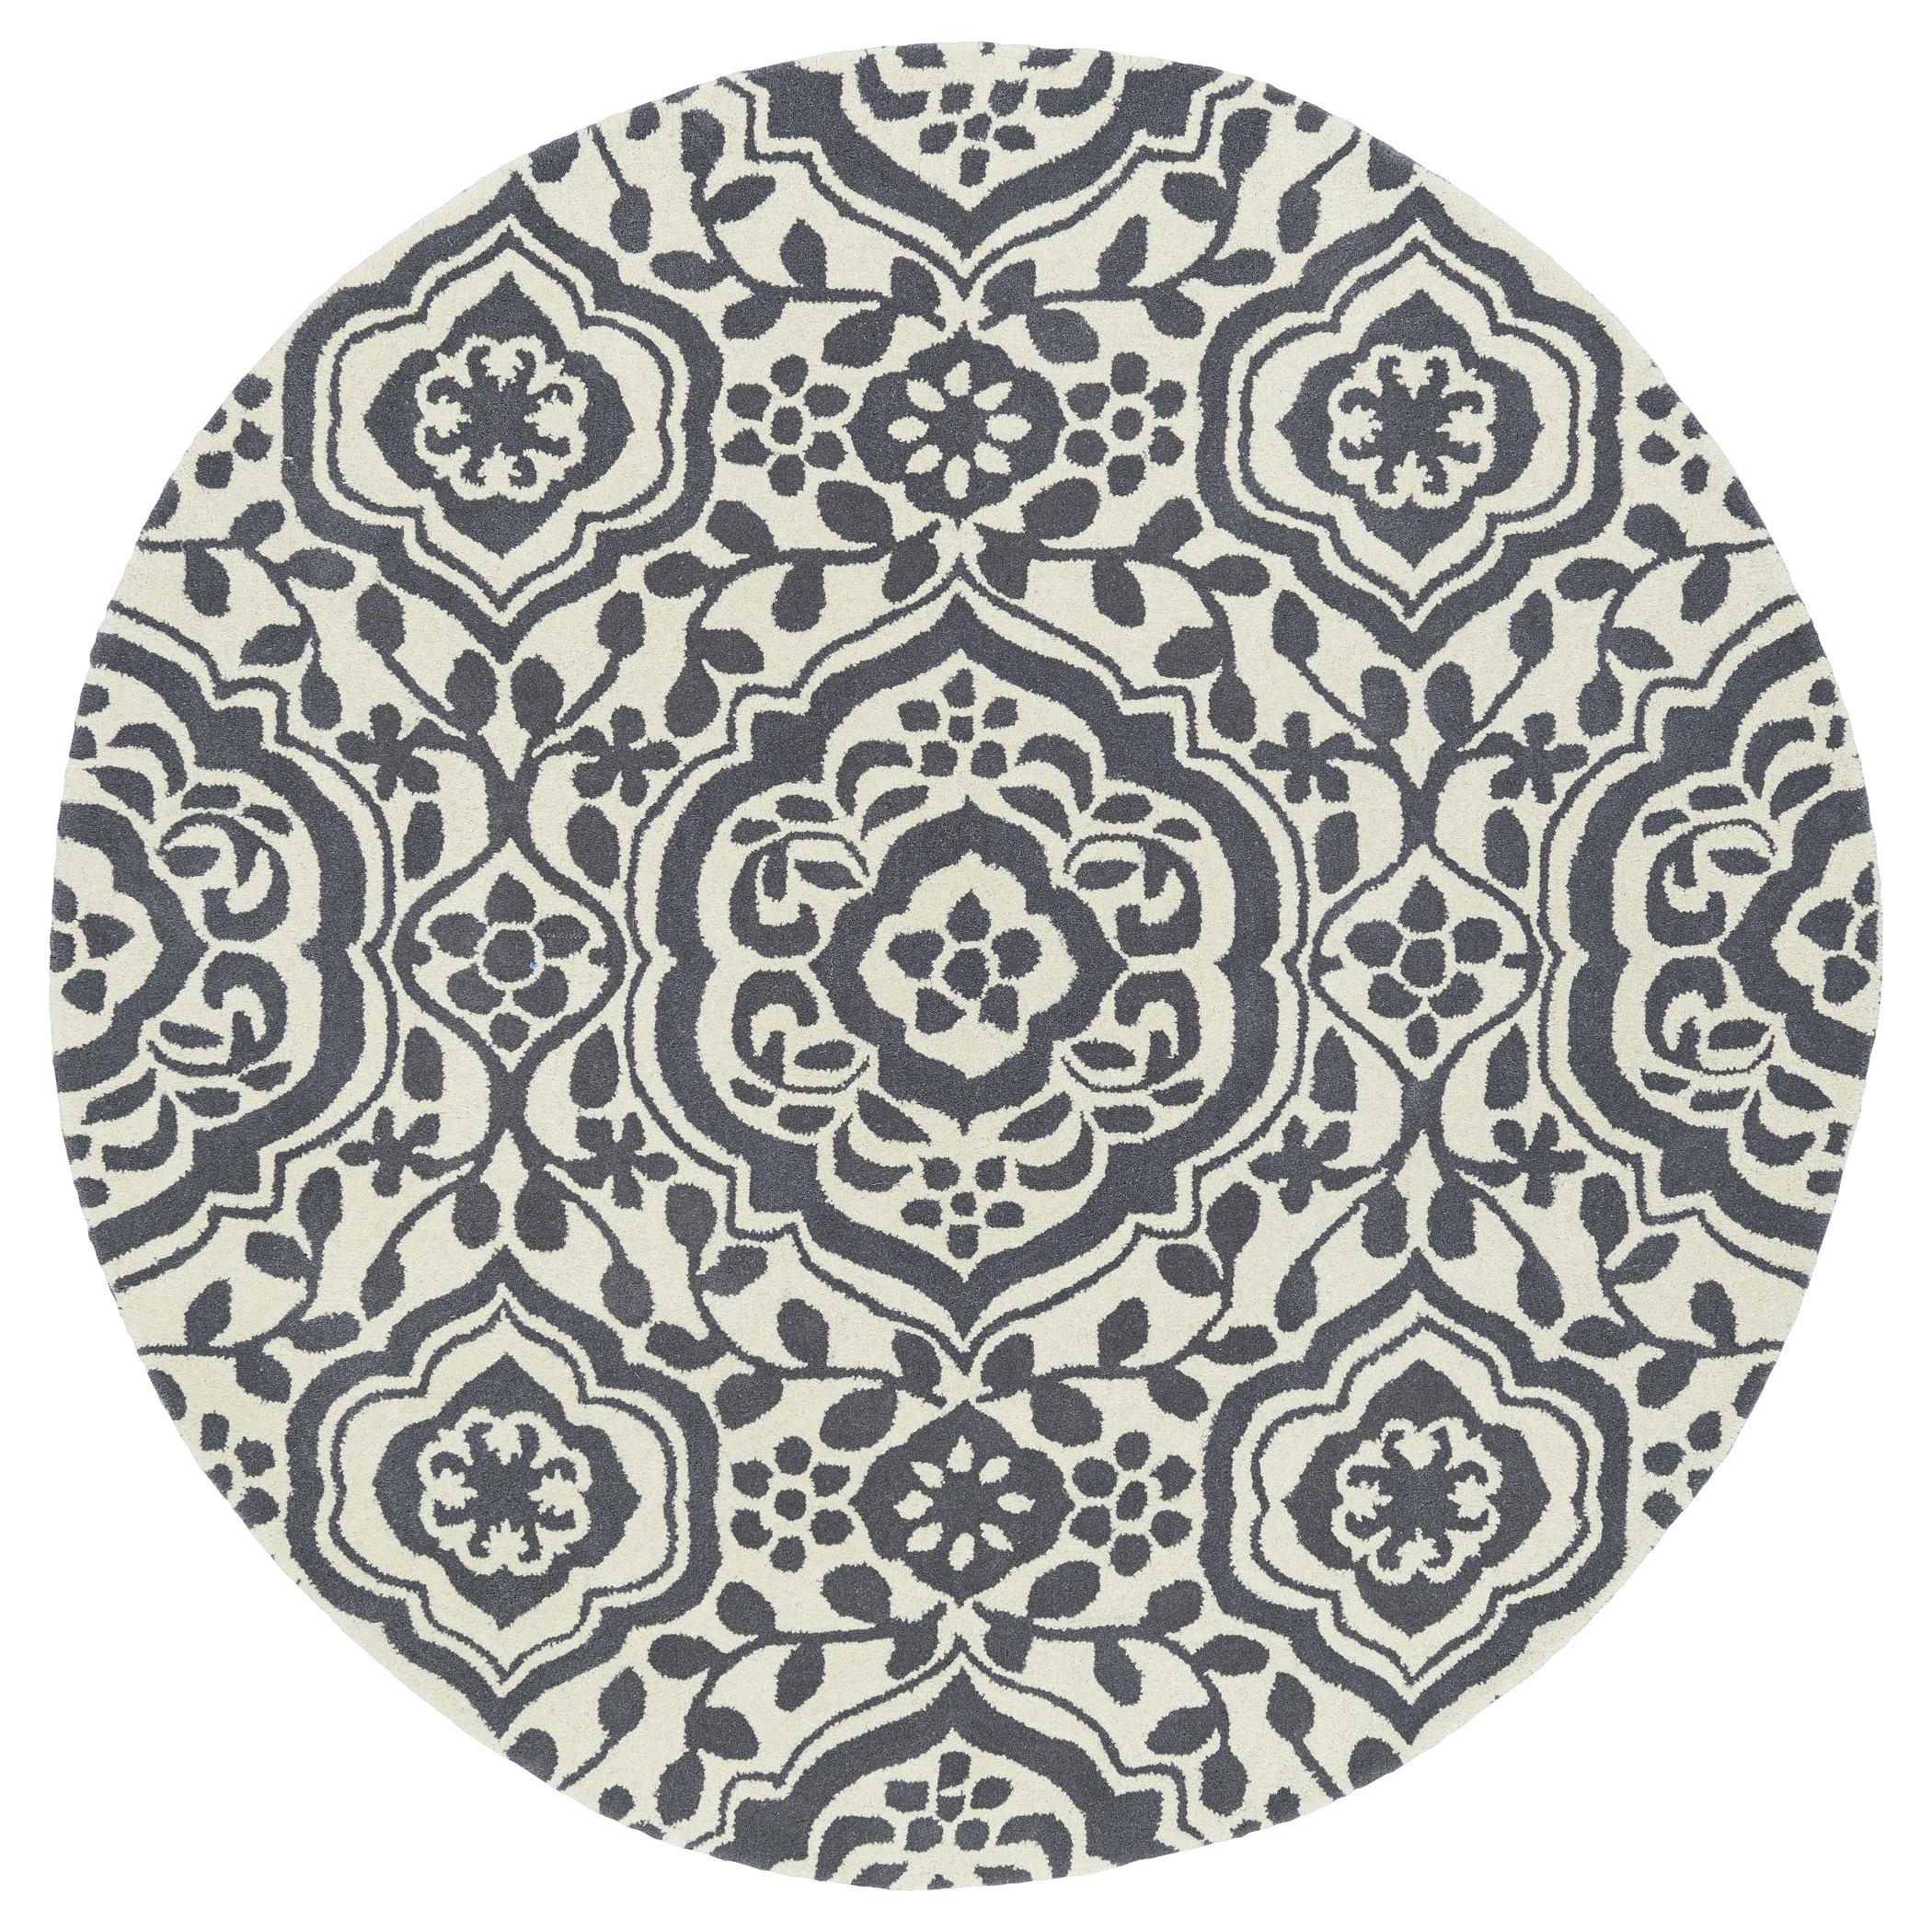 Runway Charcoal/Ivory Damask Hand-Tufted Wool Rug (119 Round) - 119 Round (Grey - 119 Round)